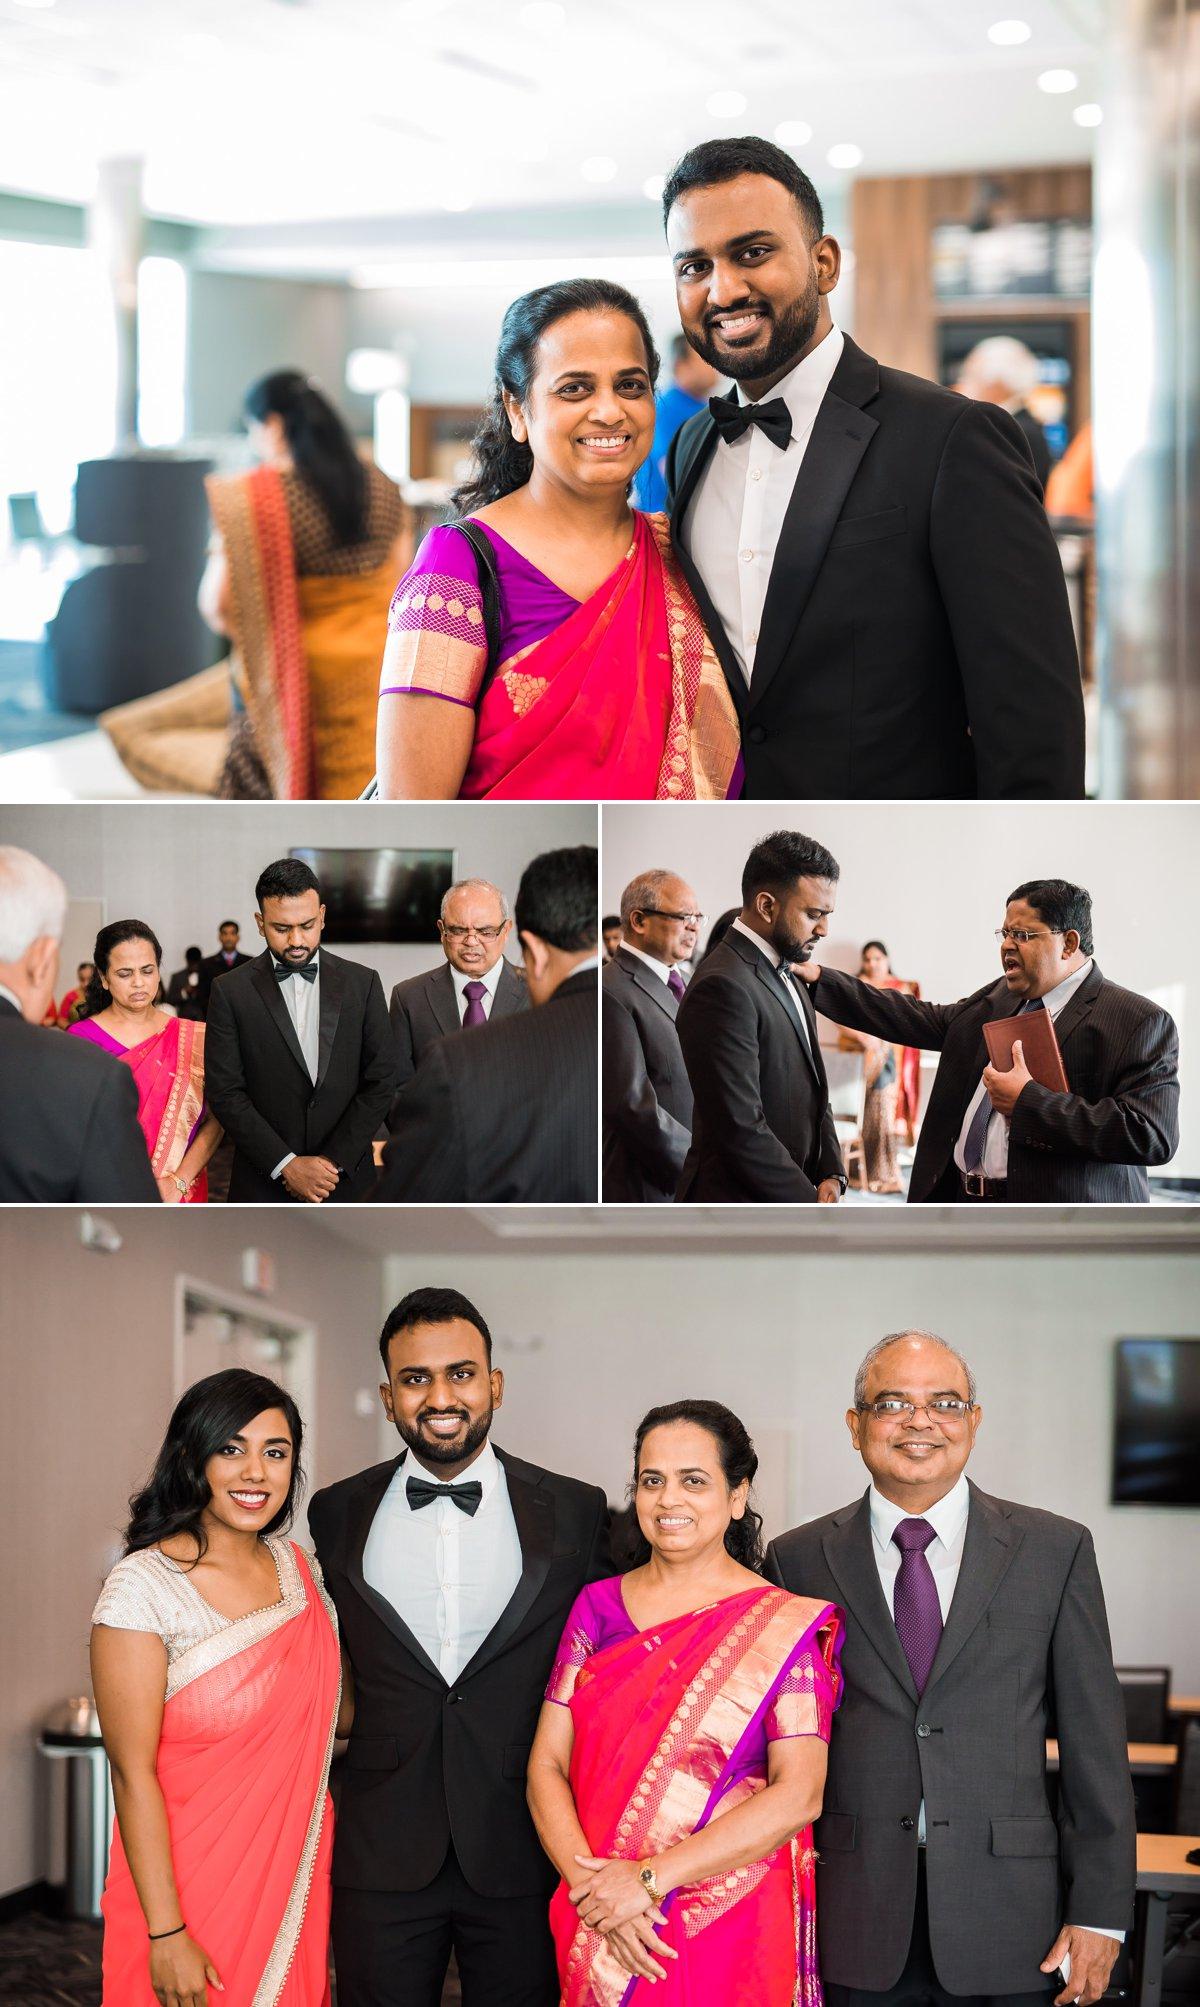 Grace & Allen Indian Wedding Photo